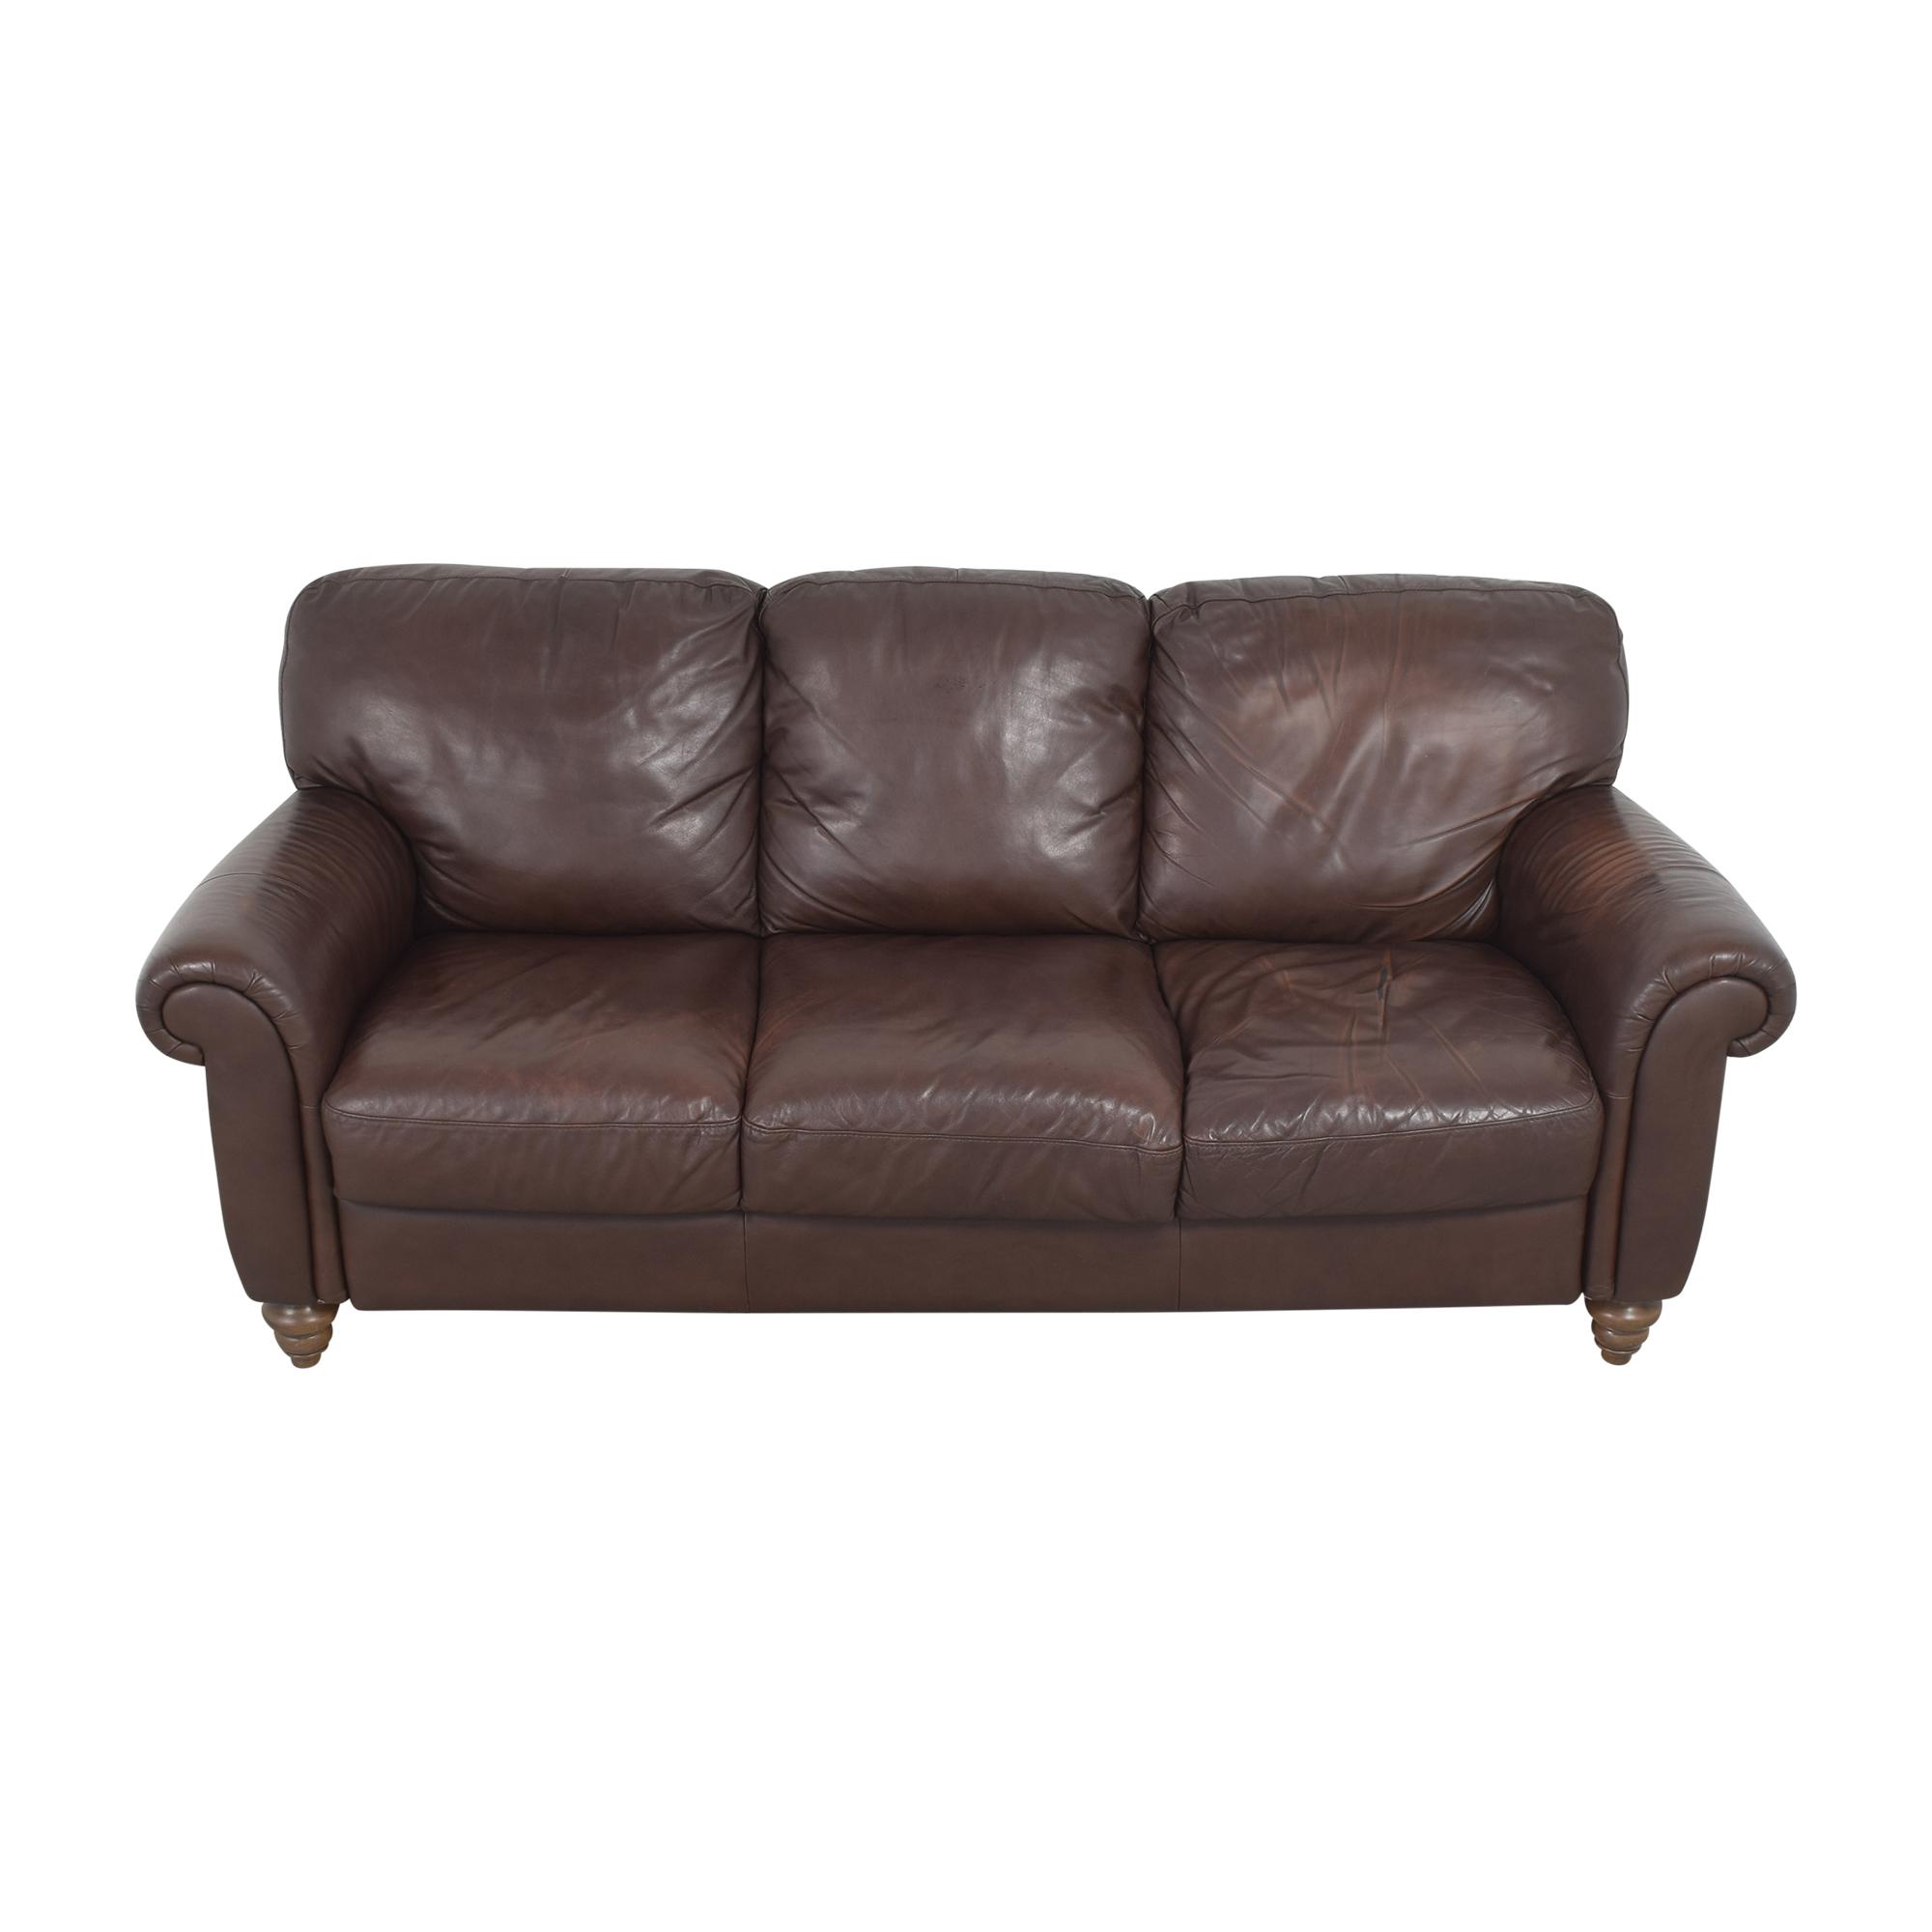 Macy's by Italsofa Roll Arm Sofa  / Sofas